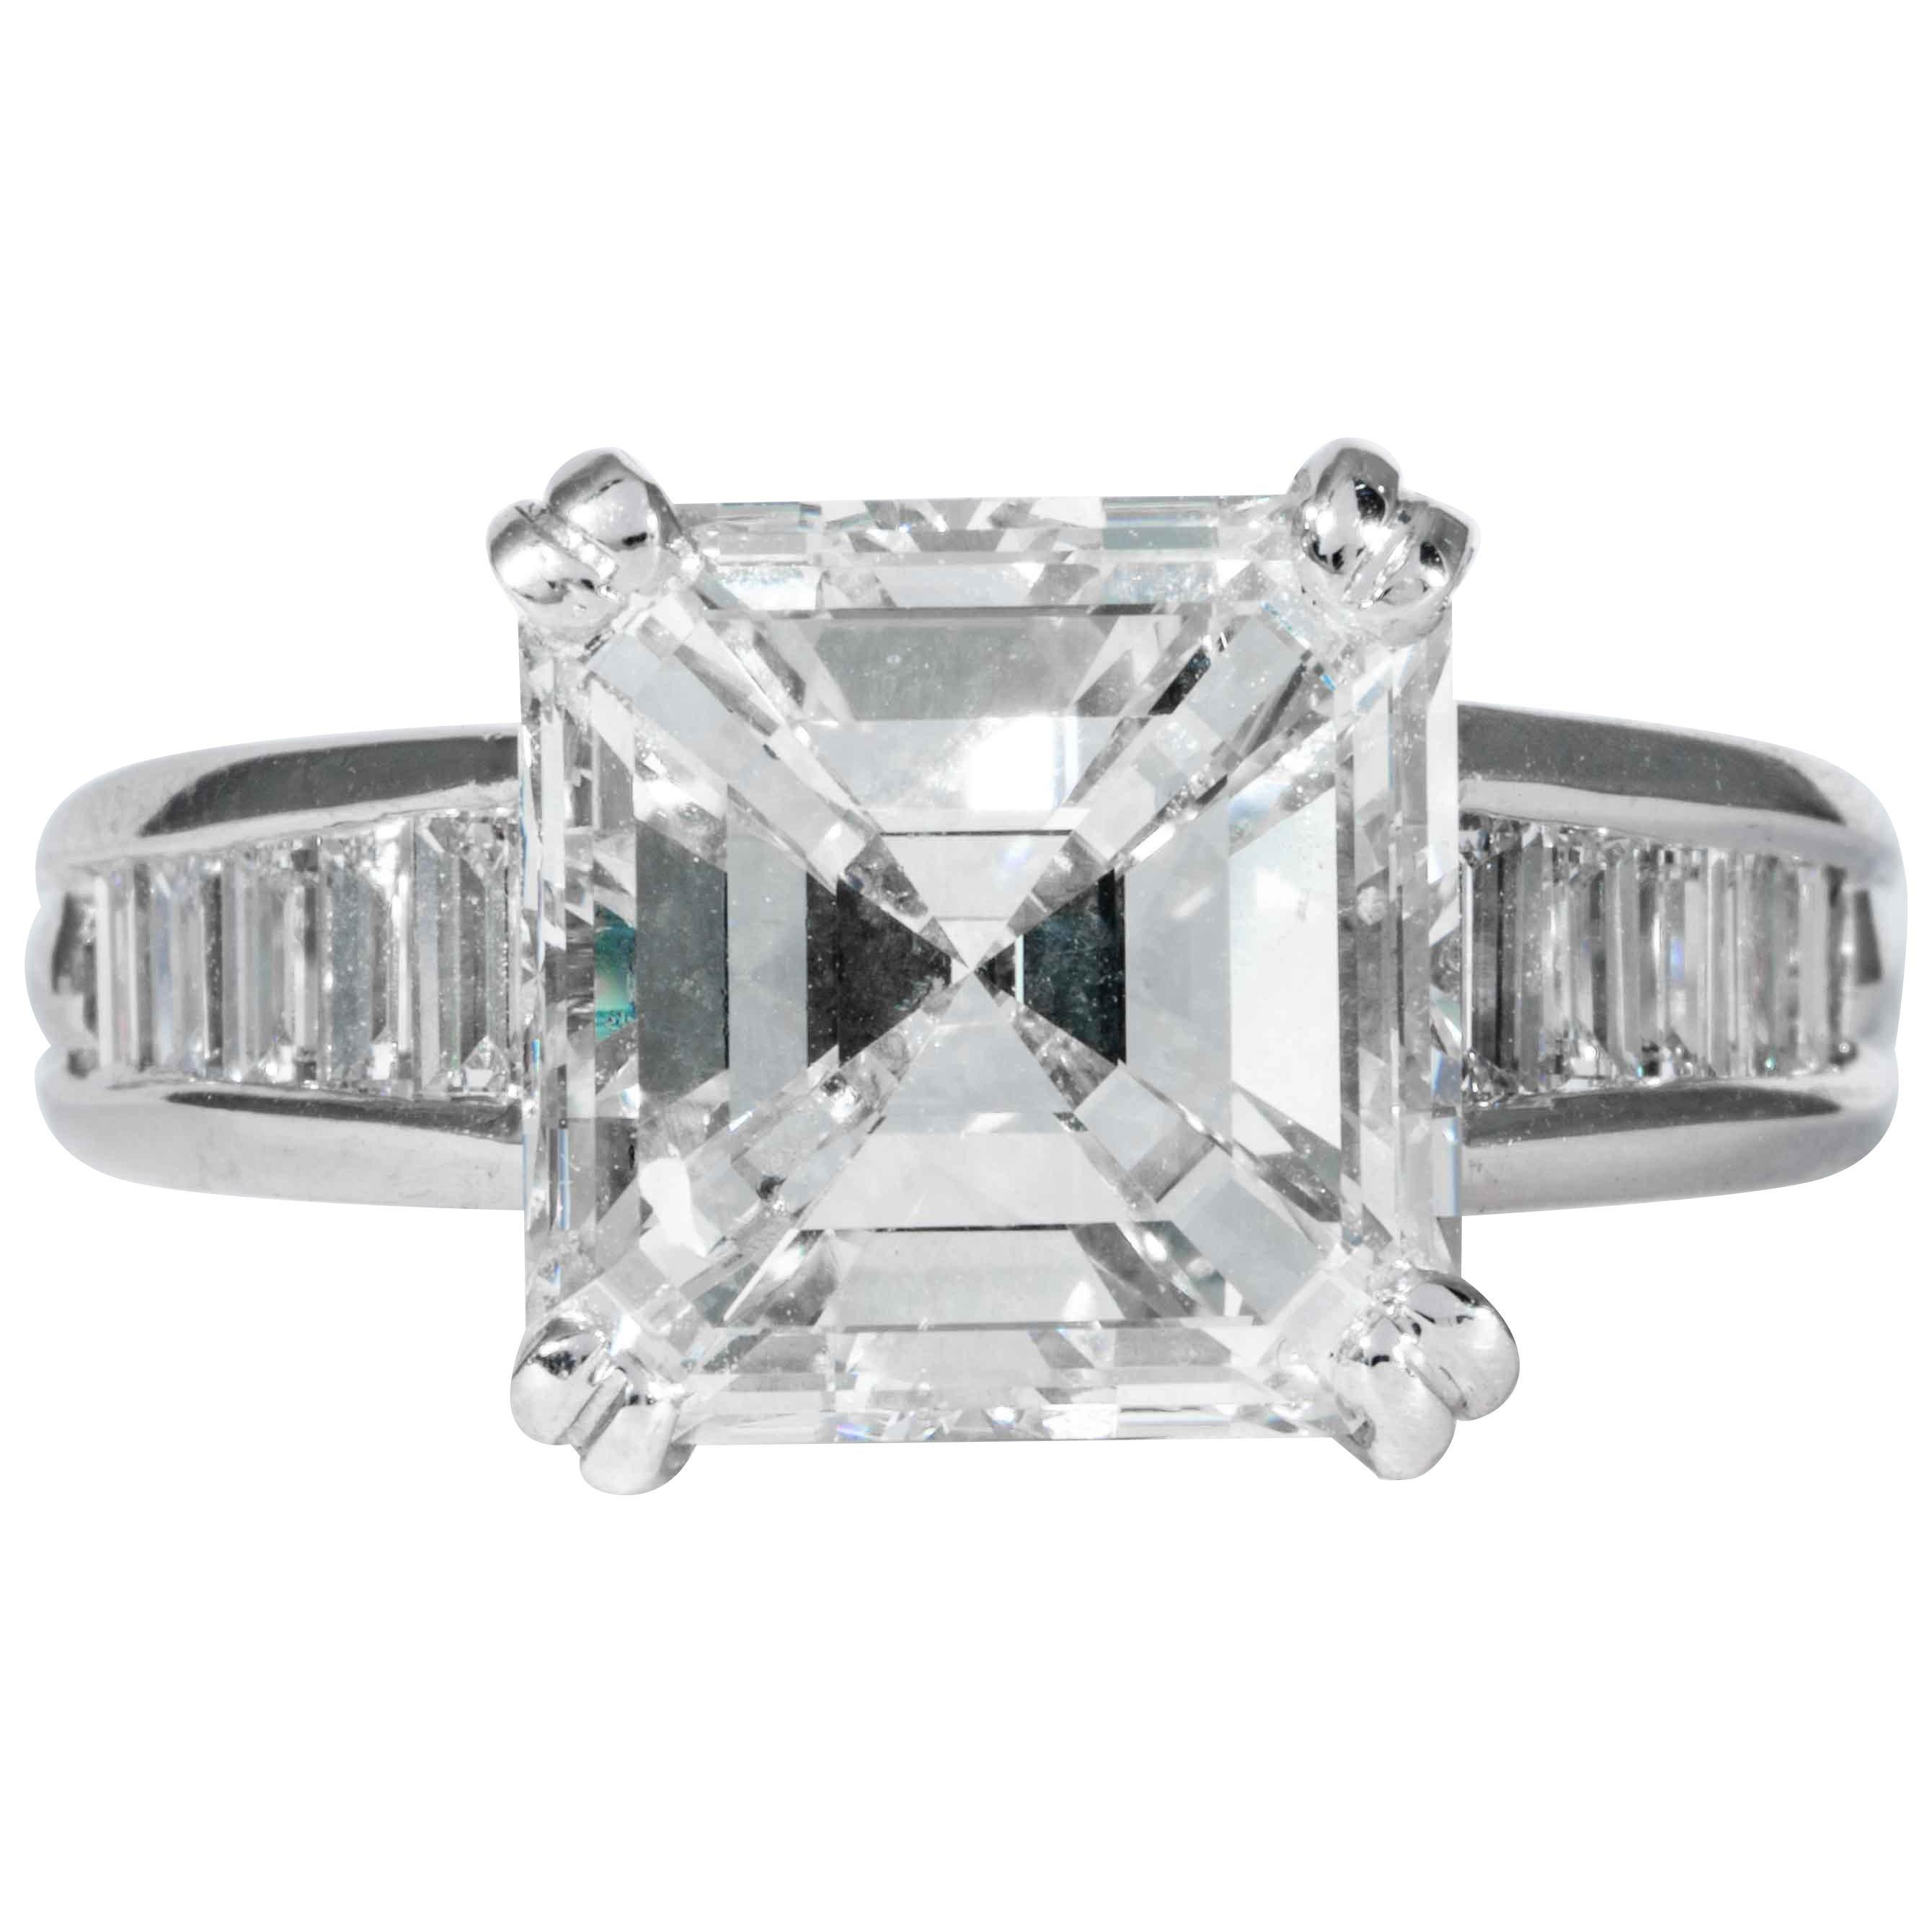 Shreve, Crump & Low GIA Certified 5.01 Carat Square Emerald Cut Diamond Ring